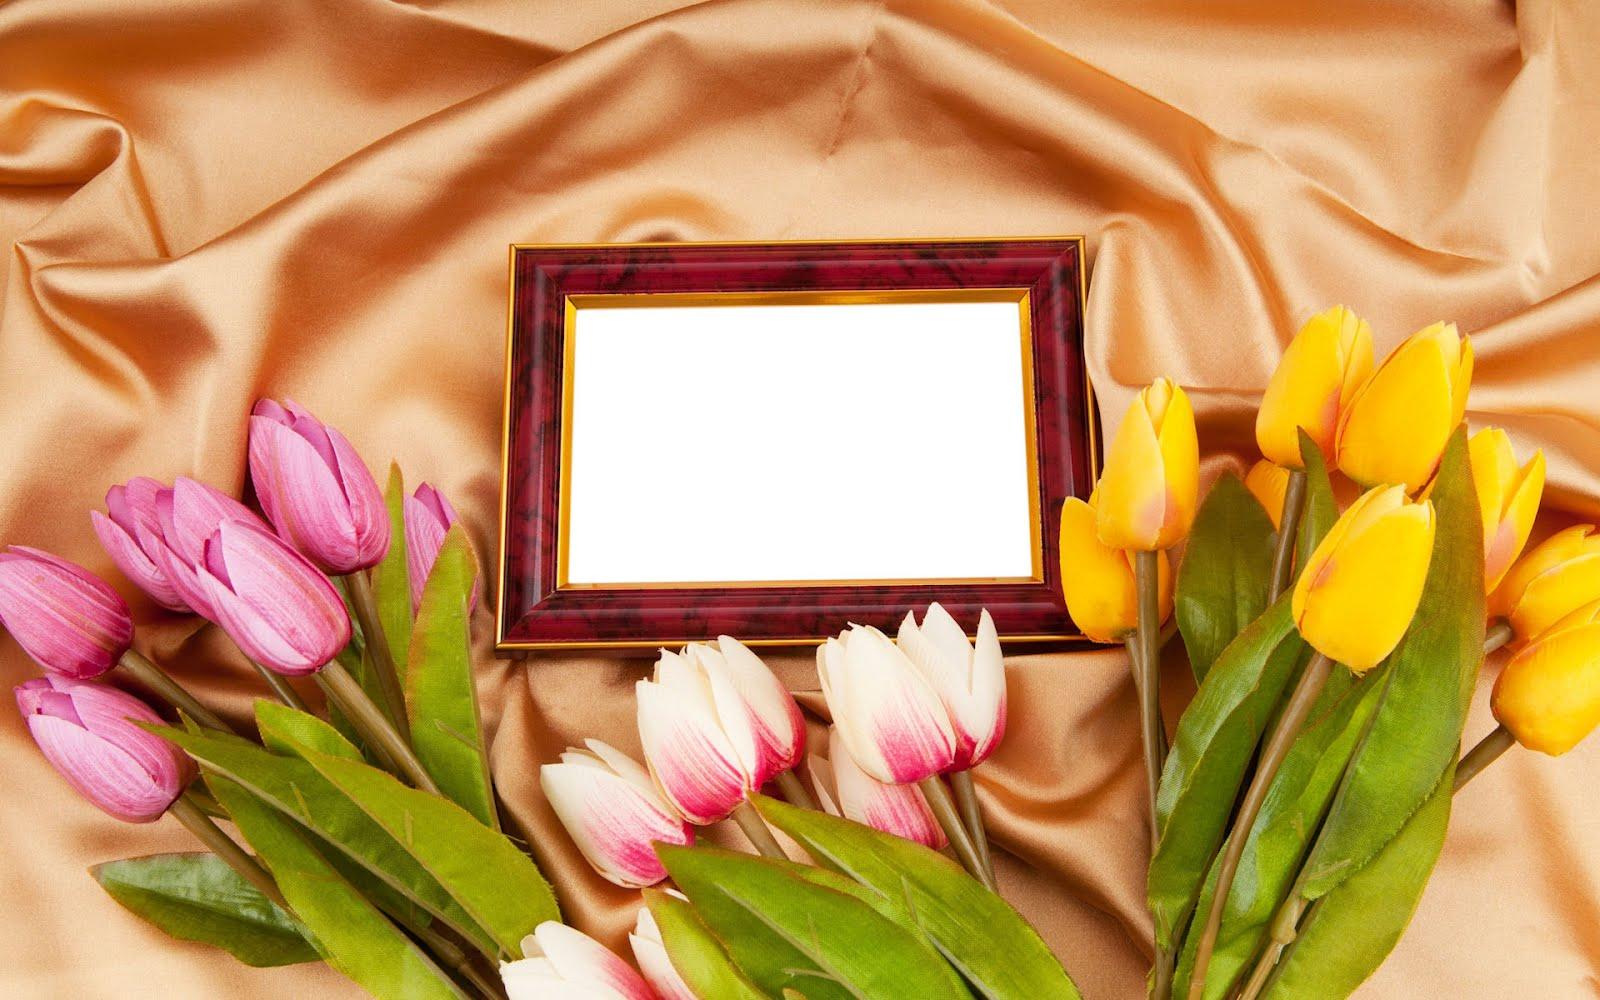 http://2.bp.blogspot.com/-4tZt6oCbUmQ/T-kZLsBgy8I/AAAAAAAA9l8/Xc4E-P6_KDs/s1600/tu-foto-aqui-en-este-marco-con-tulipanes-frame.jpg